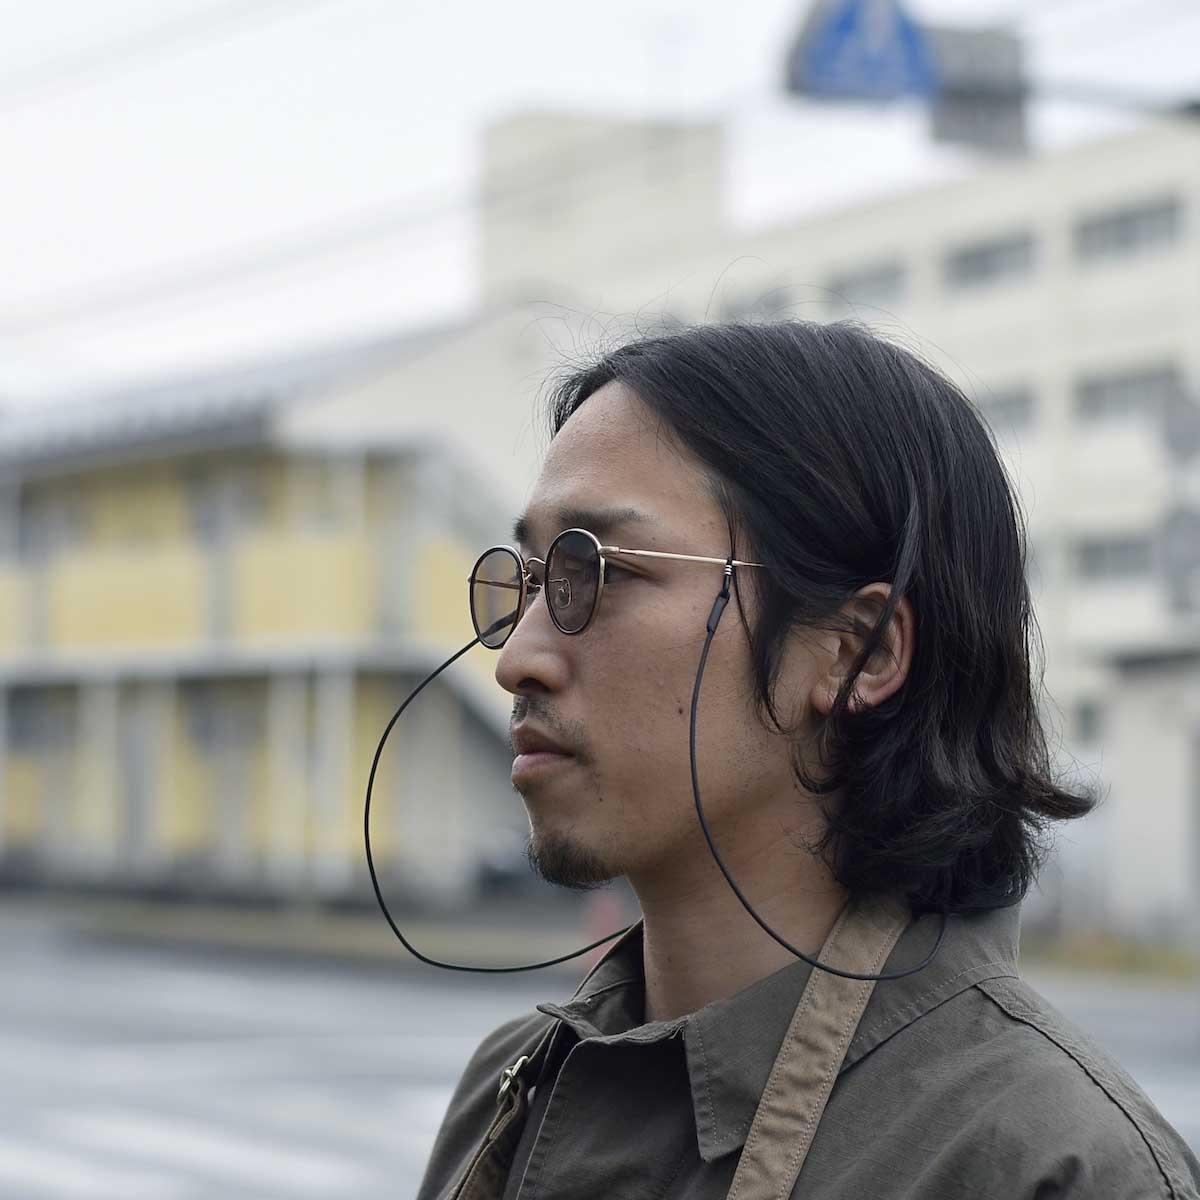 HOBO / ROUND FRAME TITANIUM GLASSES by KANEKO OPTICAL 着用イメージ②